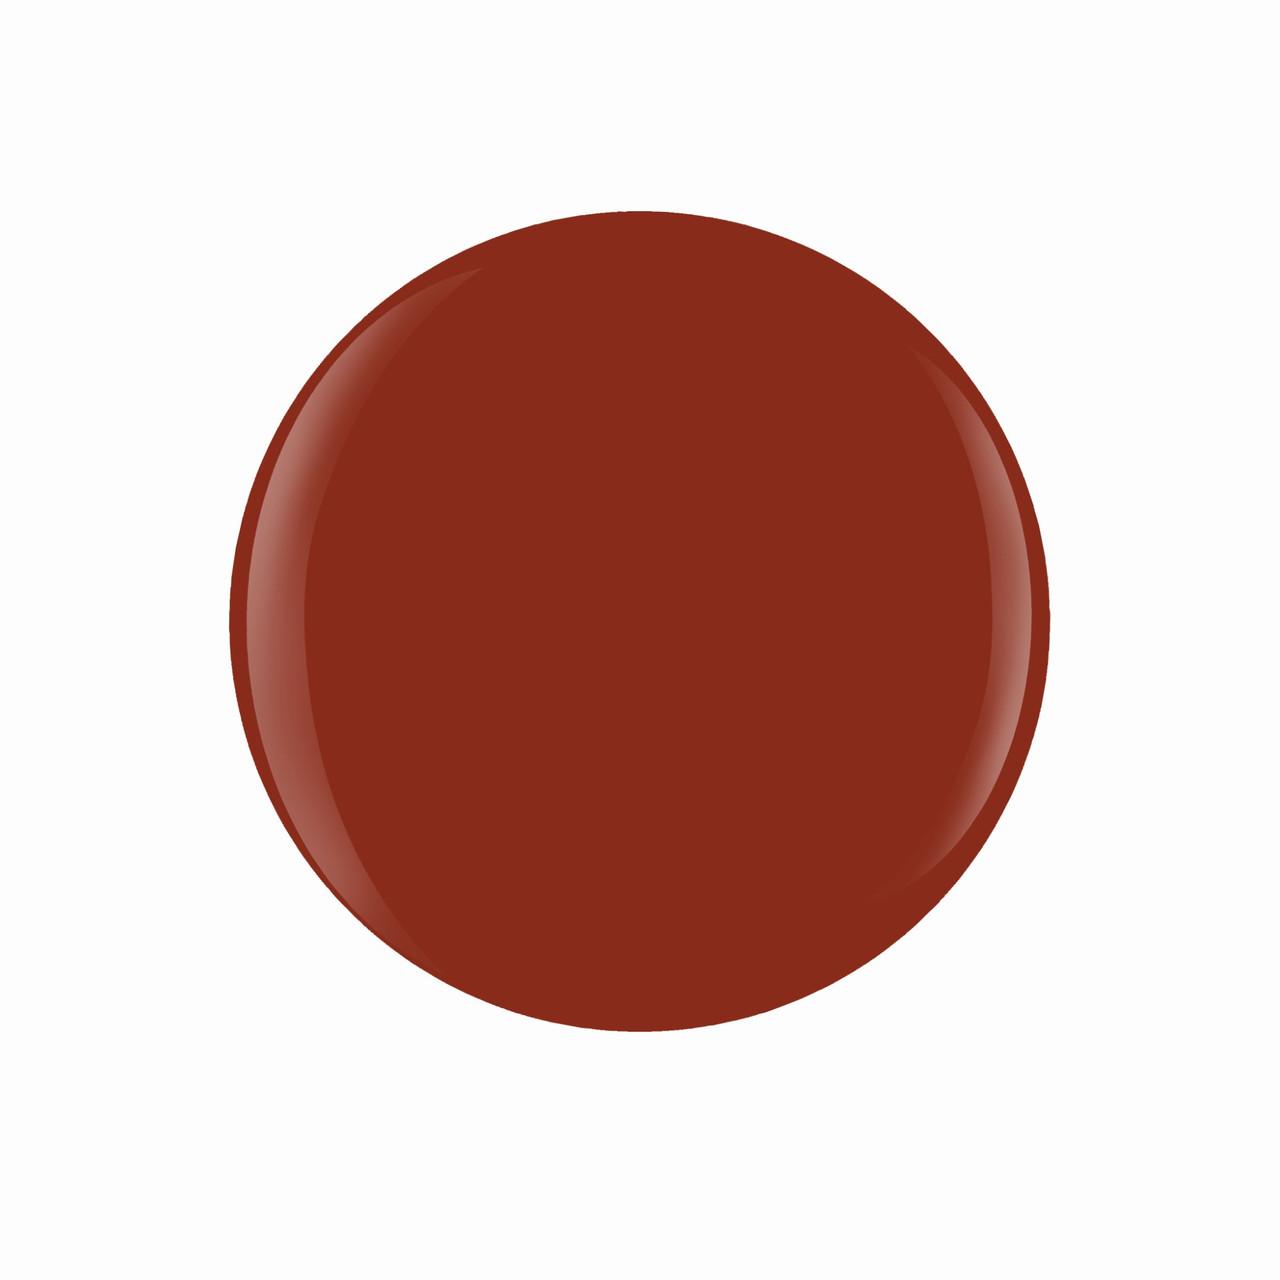 "Gelish Xpress Dip ""Afternoon Escape"" - Burnt Orange Crème - 43g   1.5 oz."